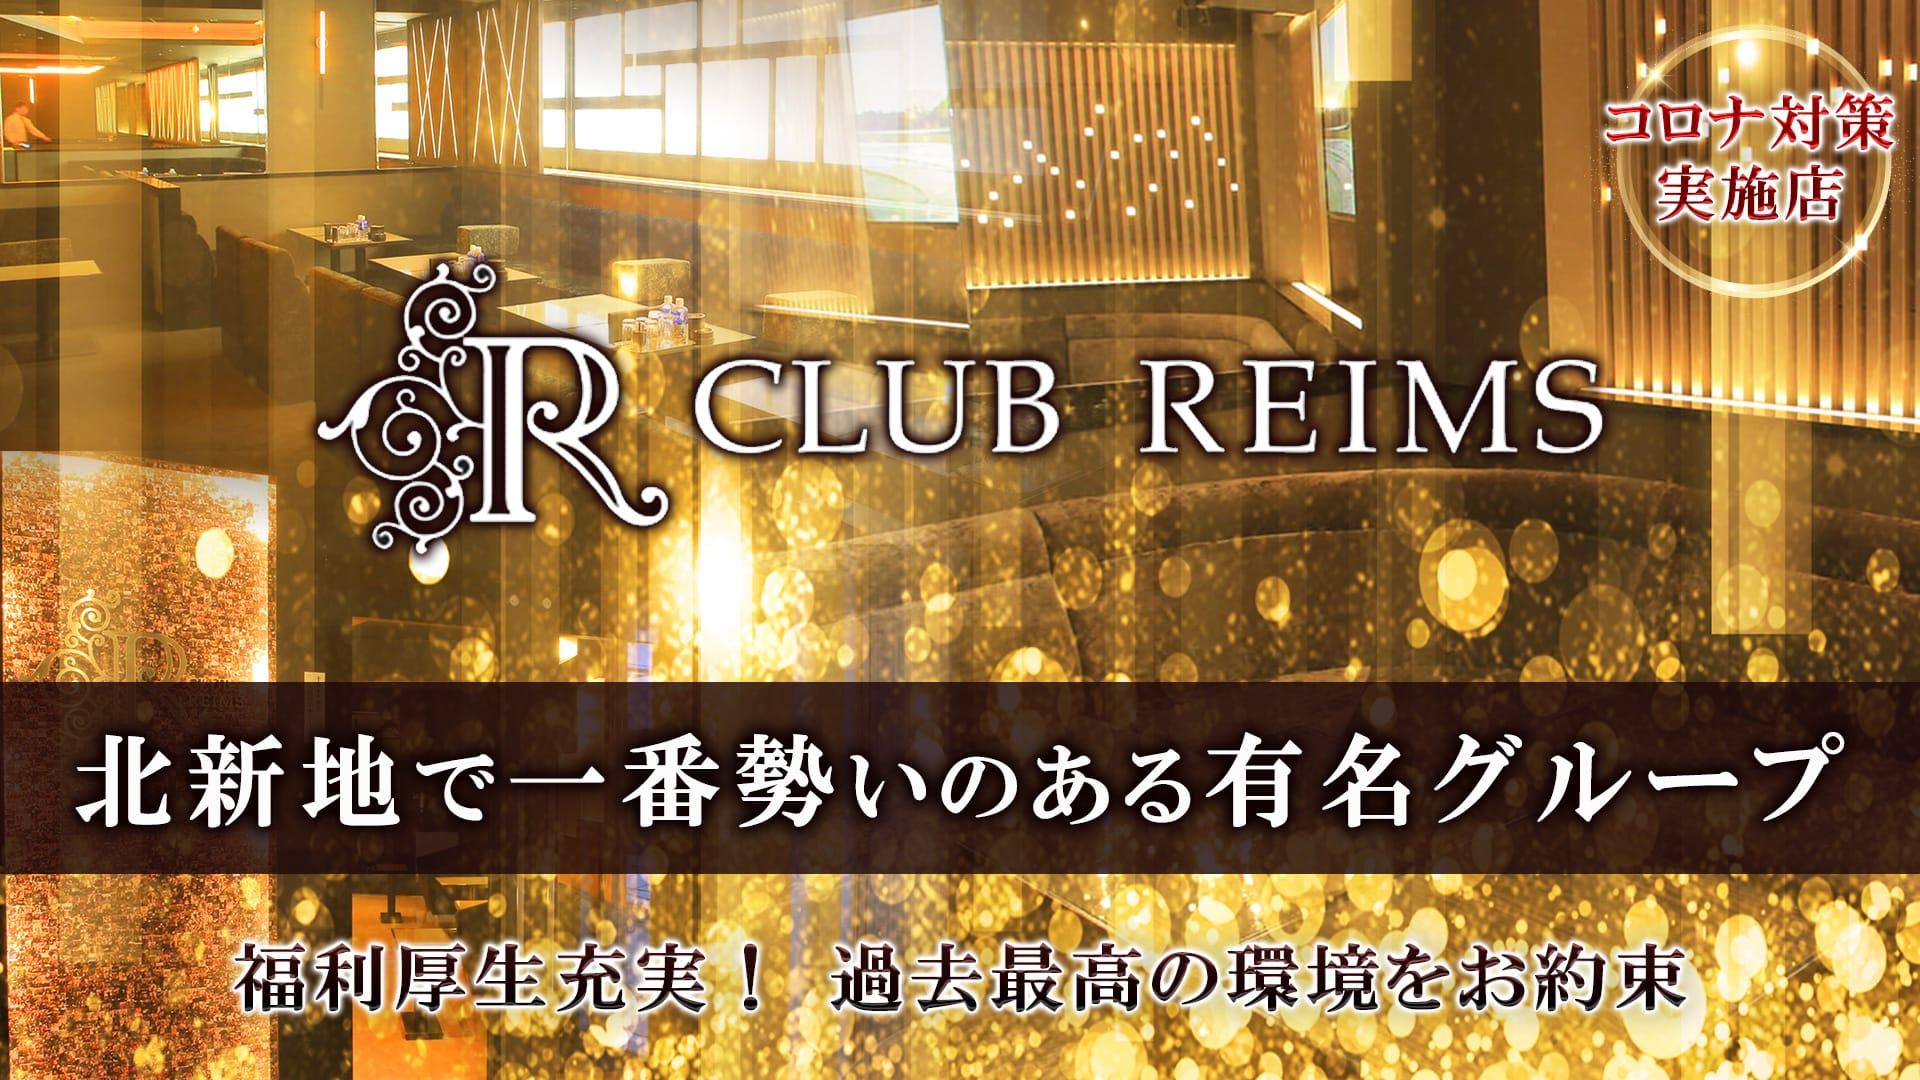 CLUB REIMS(クラブ ランス) 北新地キャバクラ TOP画像